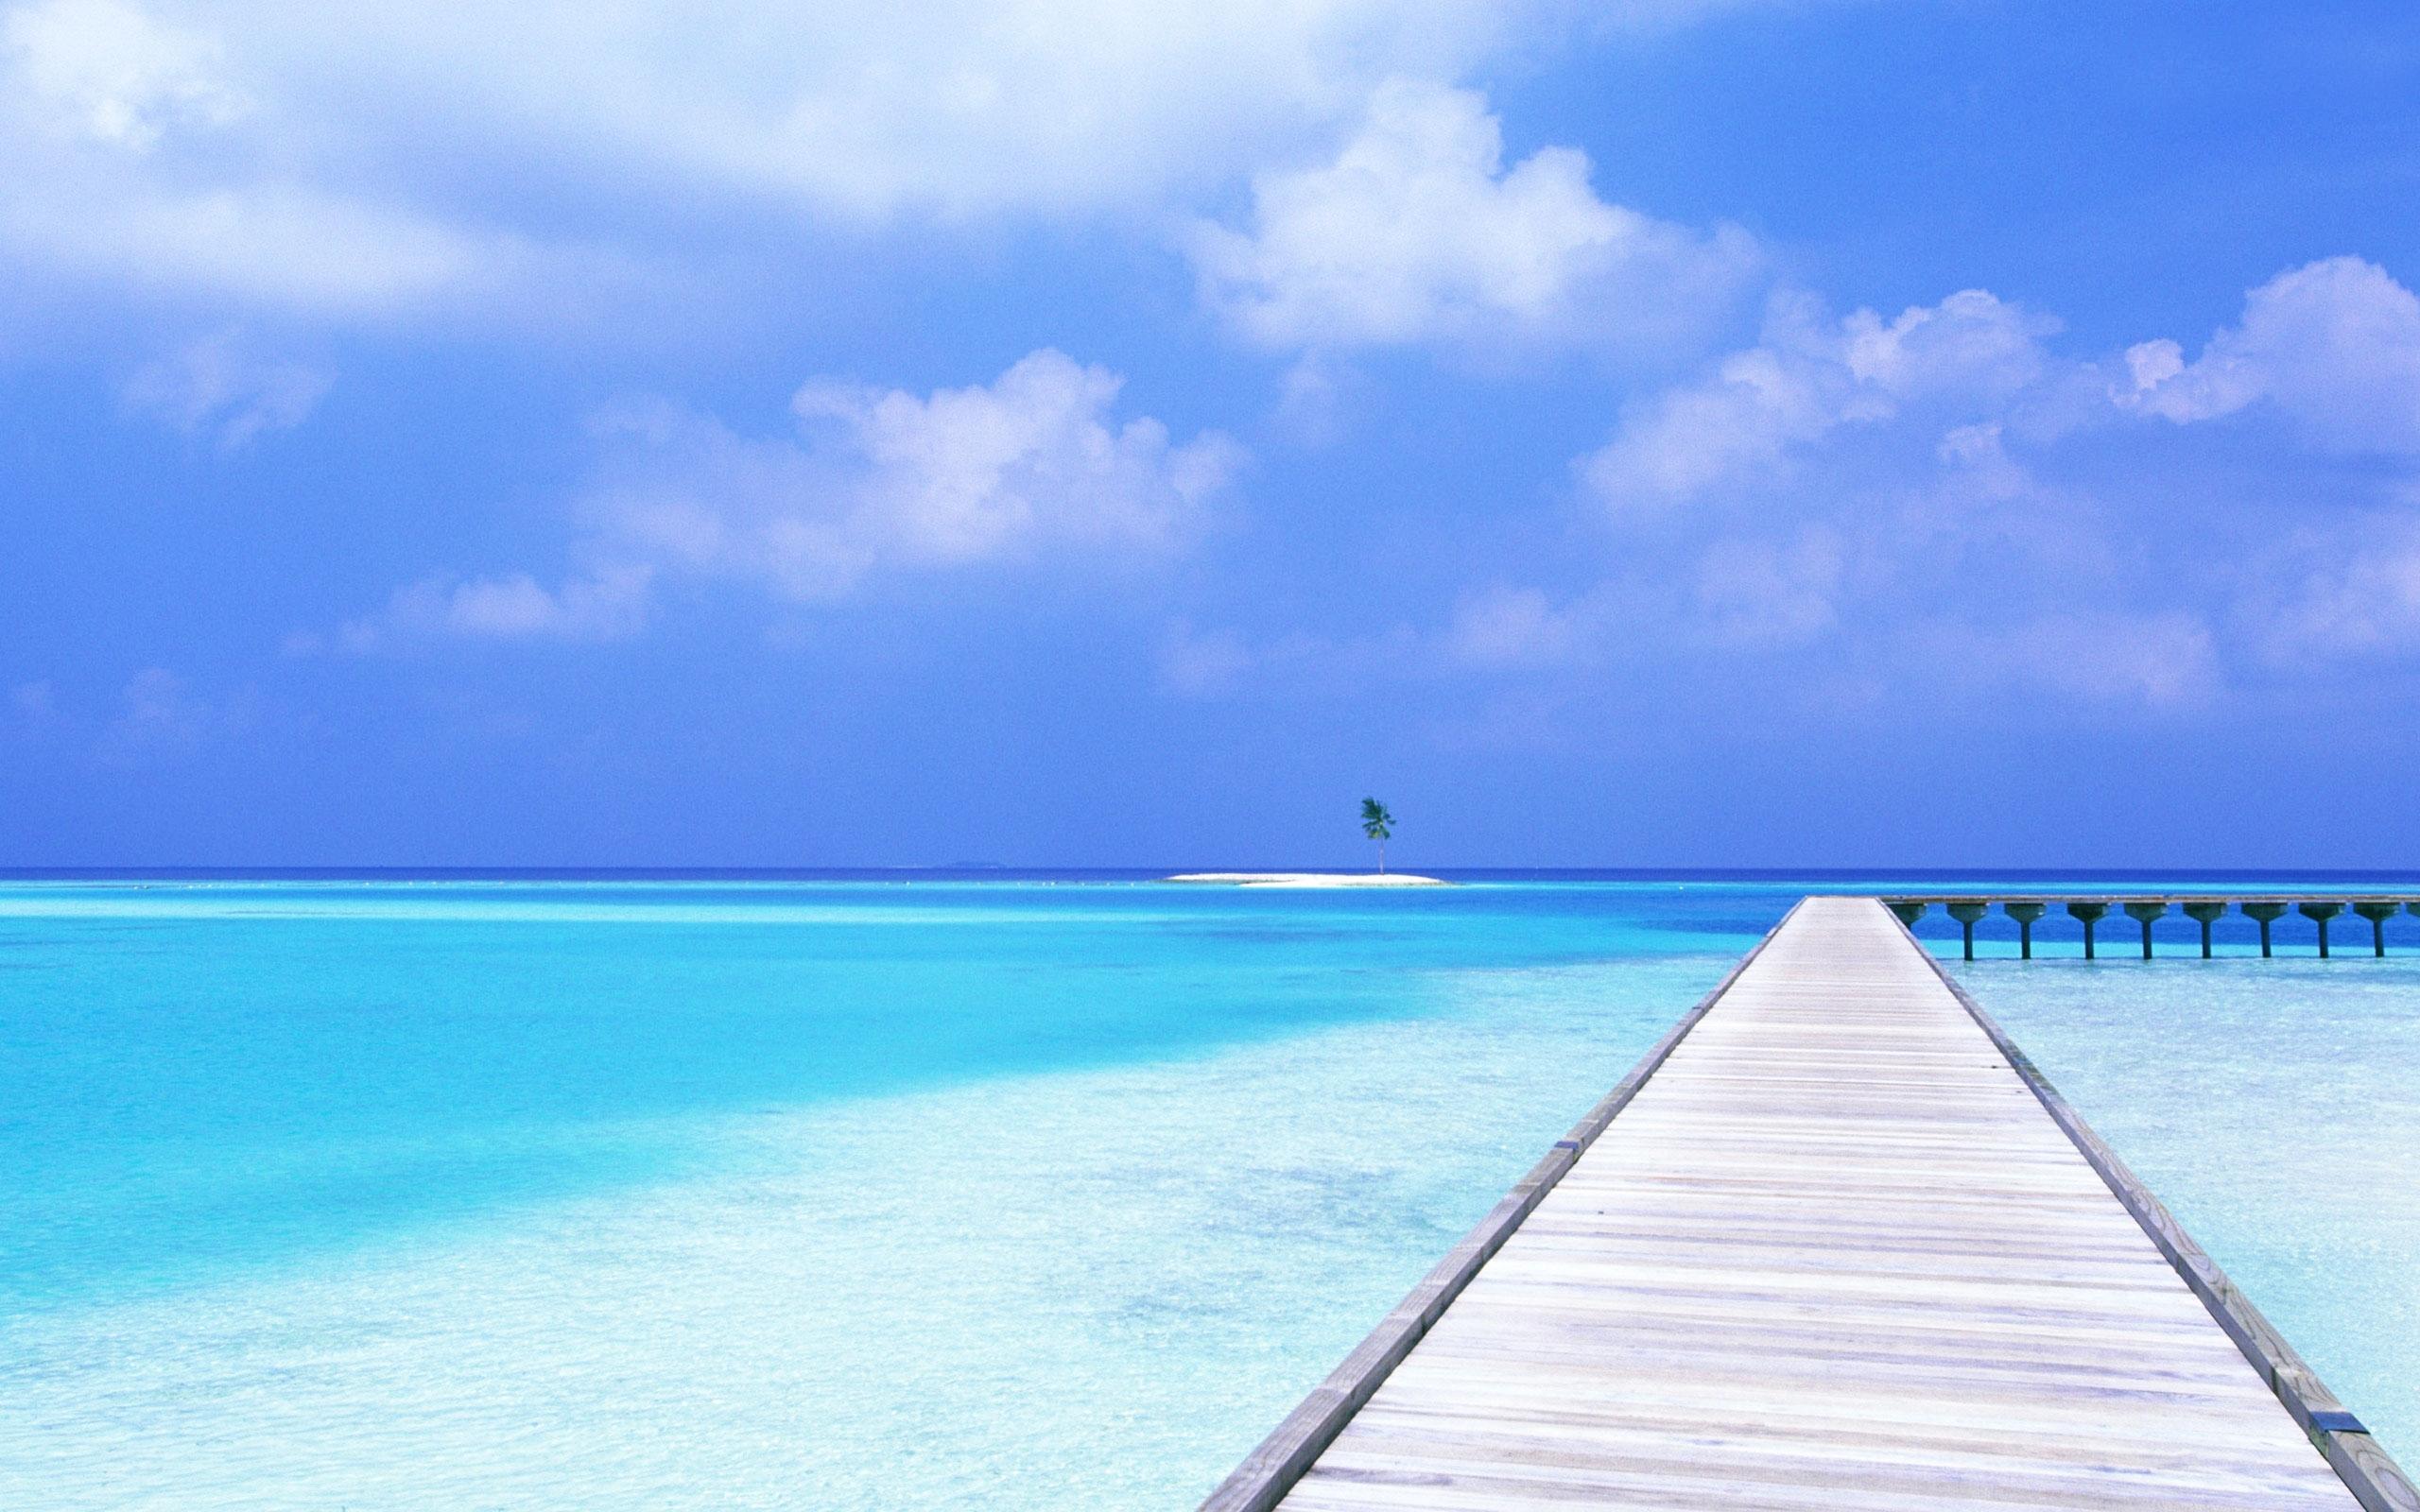 hd amazing ocean wallpapers pc desktop - hd free wallpaper - desktop